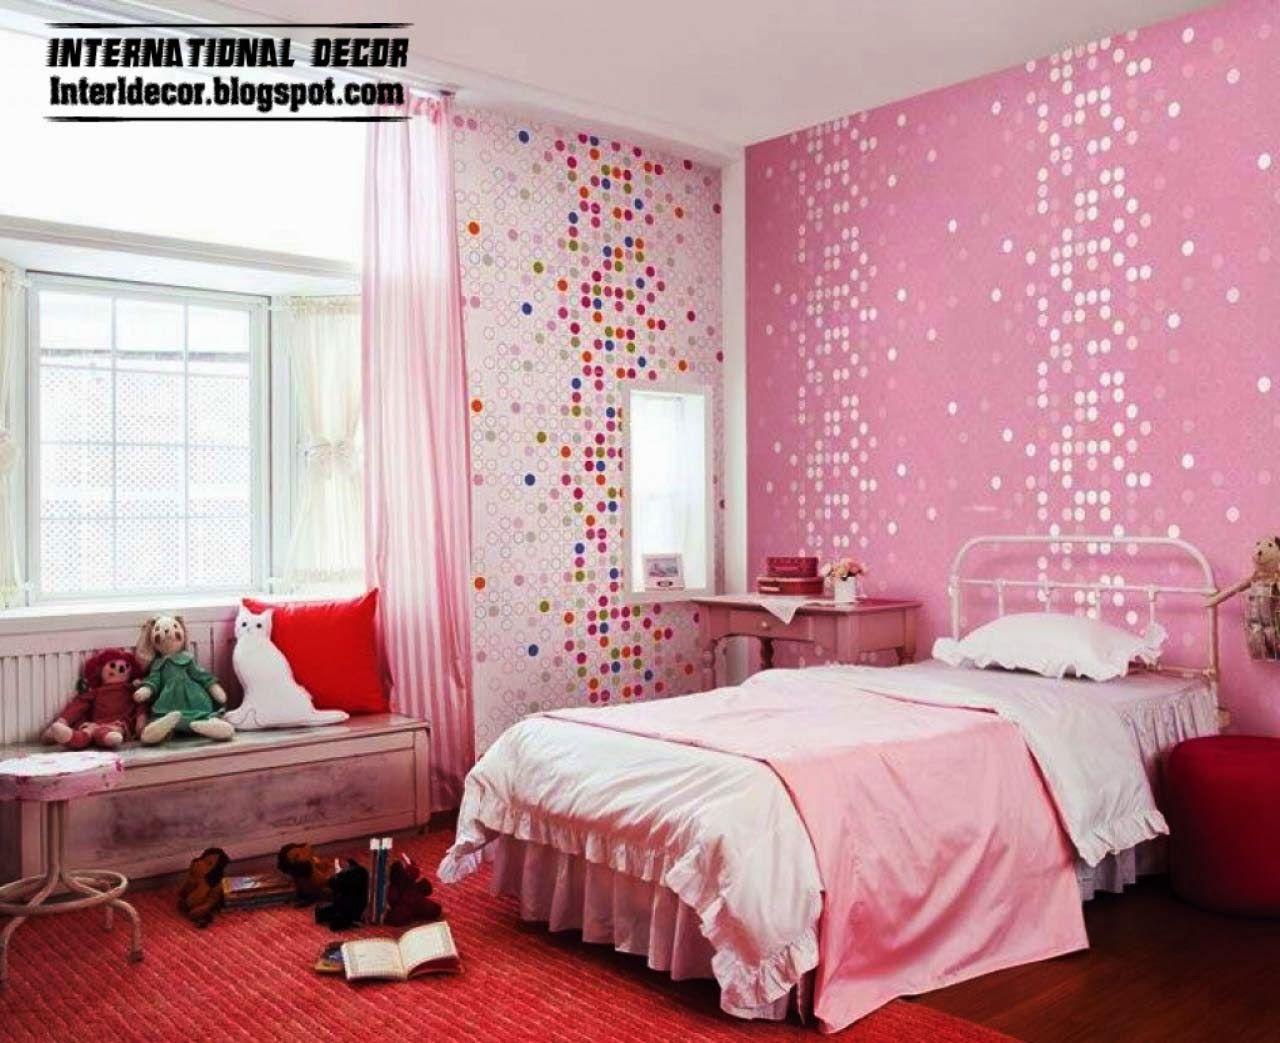 Bedroom Houses Ideas 2014 Pink Girls Bedroom Ideas 2014 Modern